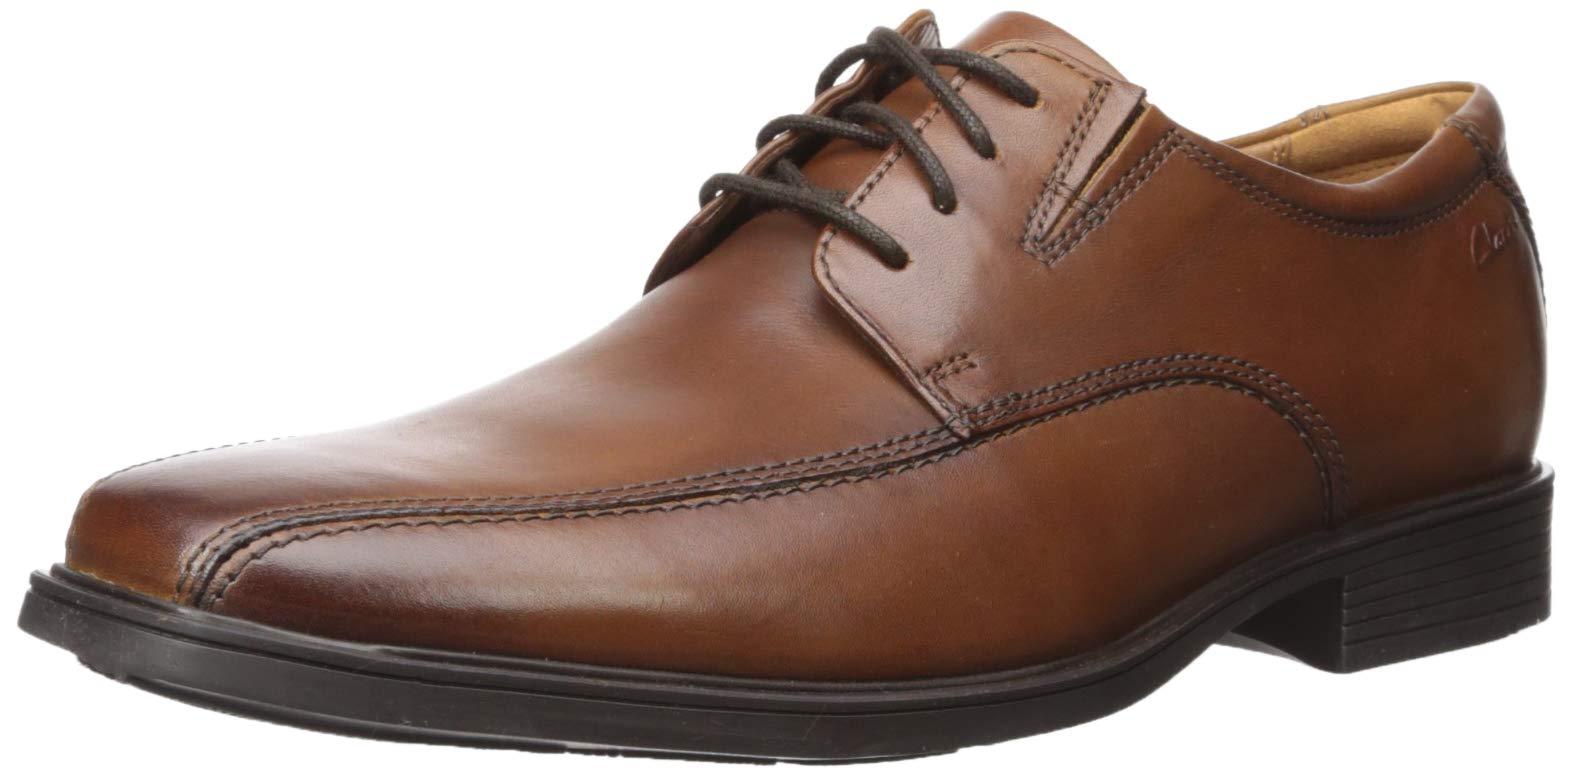 CLARKS Men's Tilden Walk Oxford, Dark Tan Leather, 12 M US